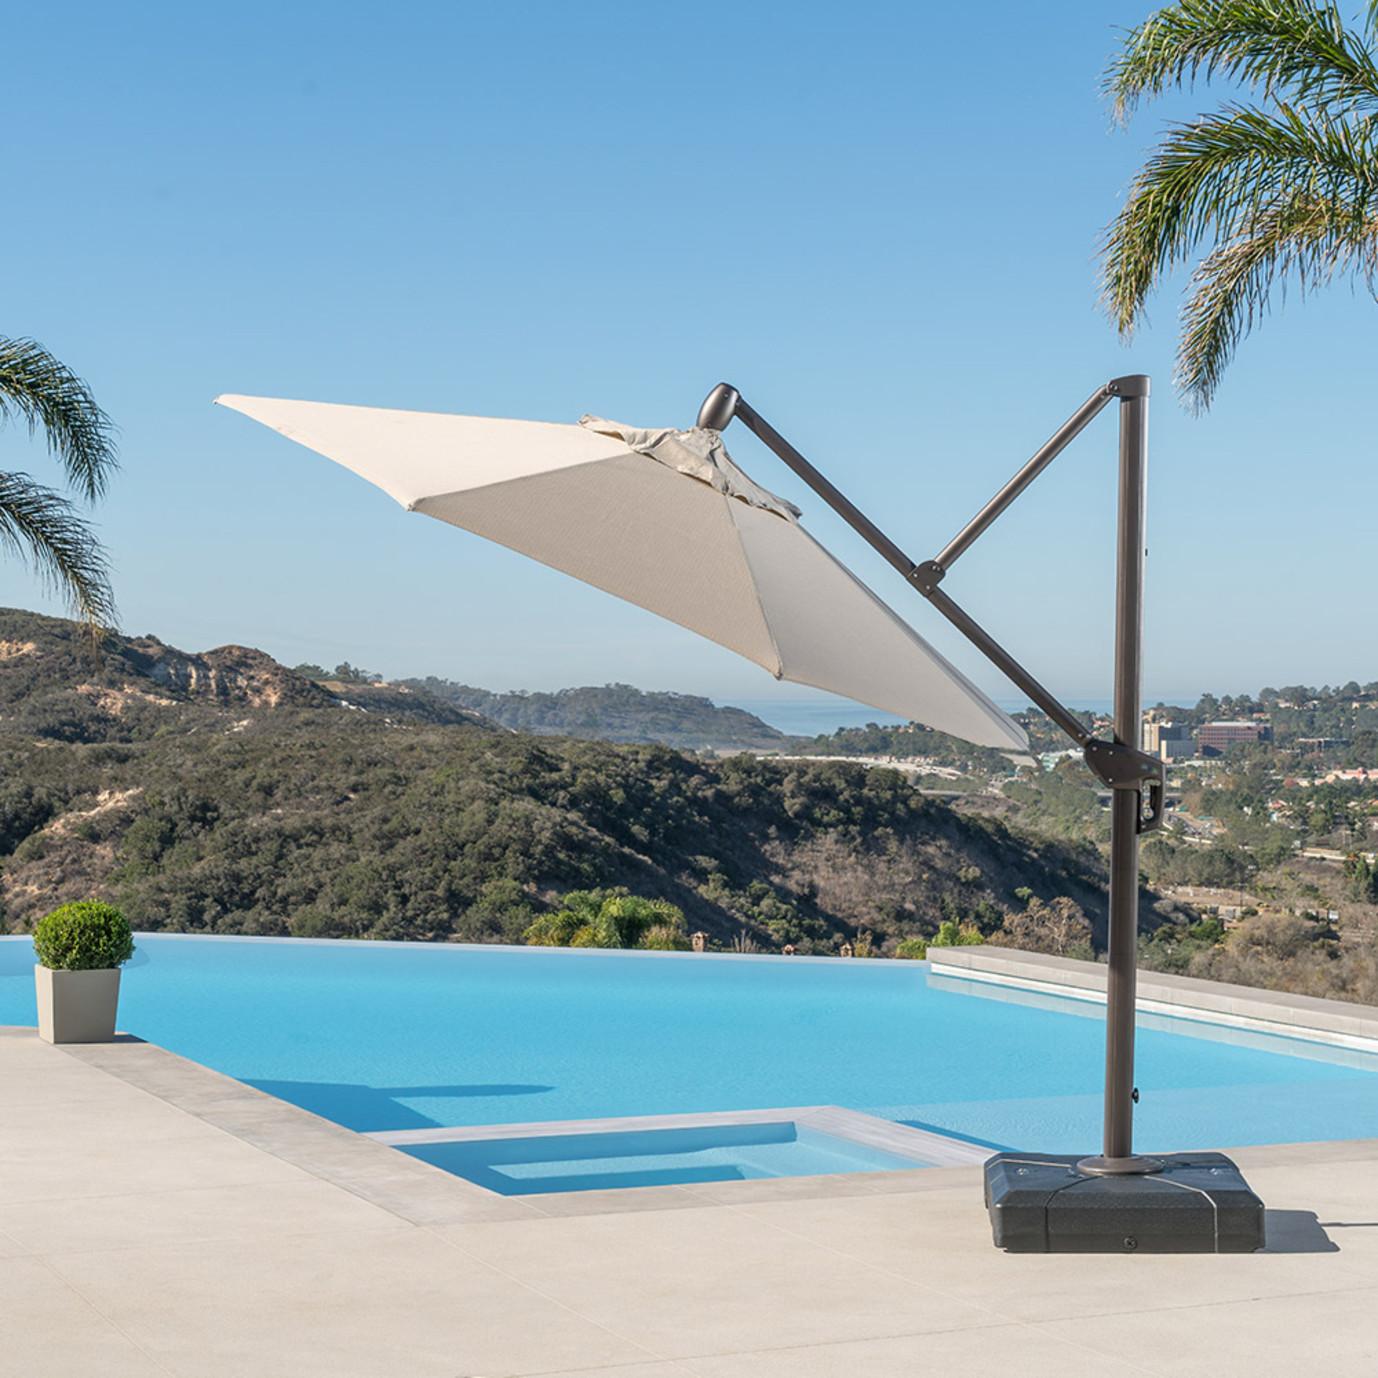 10 Round Offset Umbrella In Slate Grey Rst Brands